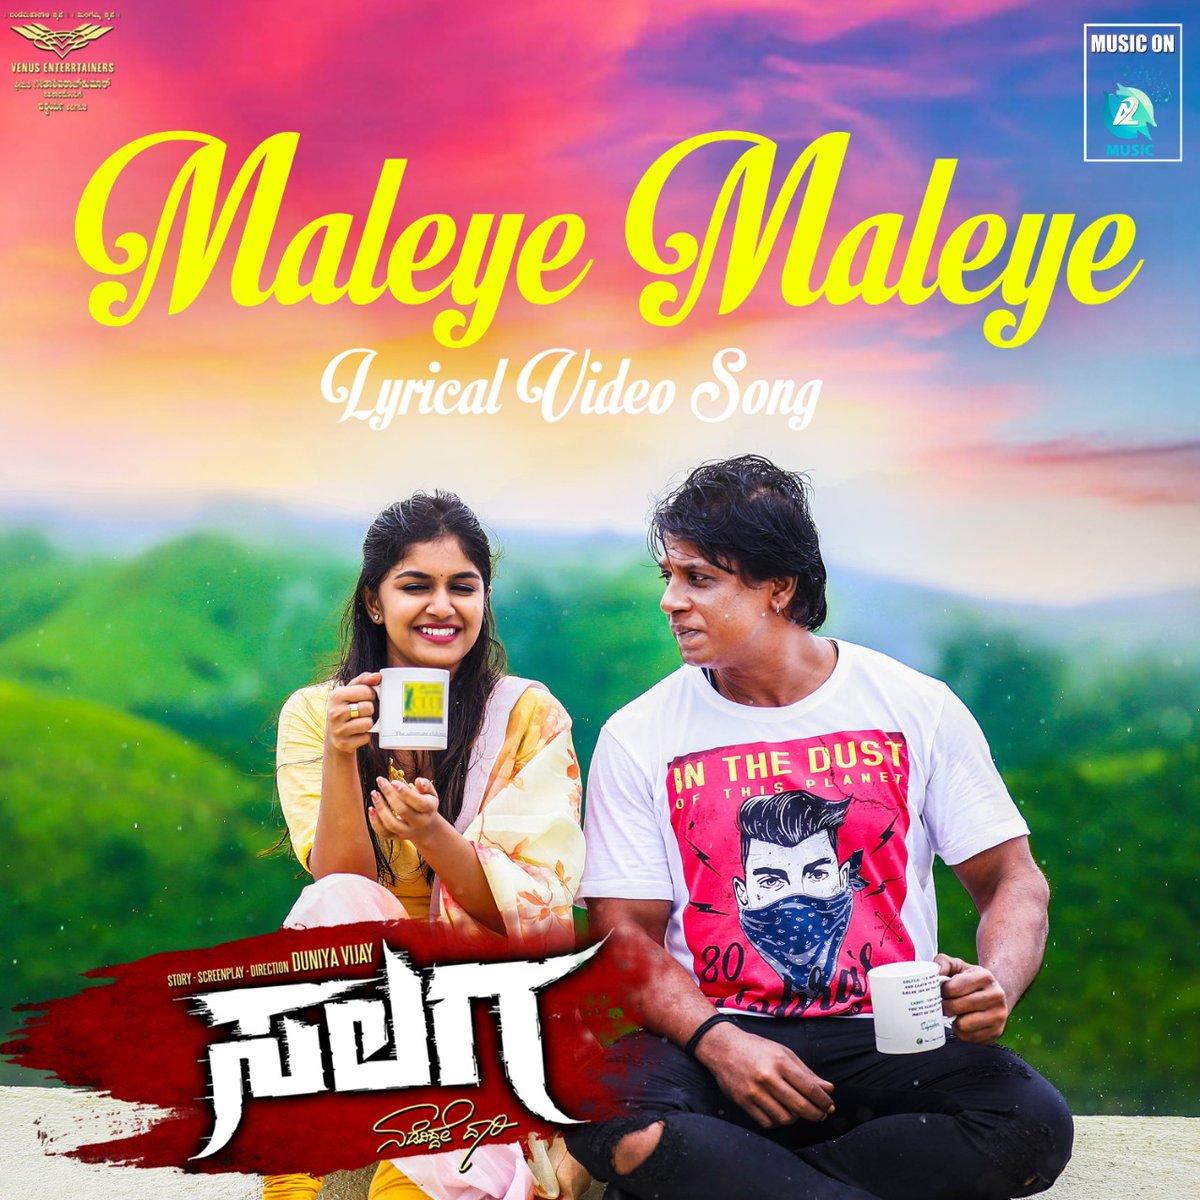 Thank You #PoweStar @PuneethRajkumar for Releasing Maleye Maleye Lyrical Video Song youtu.be/Nv_EUPZUdsw #MaleyeMaleye #Salaga @OfficialViji @Dhananjayaka @SanjanaAnand11 @kp_sreekanth @charanrajmr2701 @A2Music2 VENUS Enterrtainers